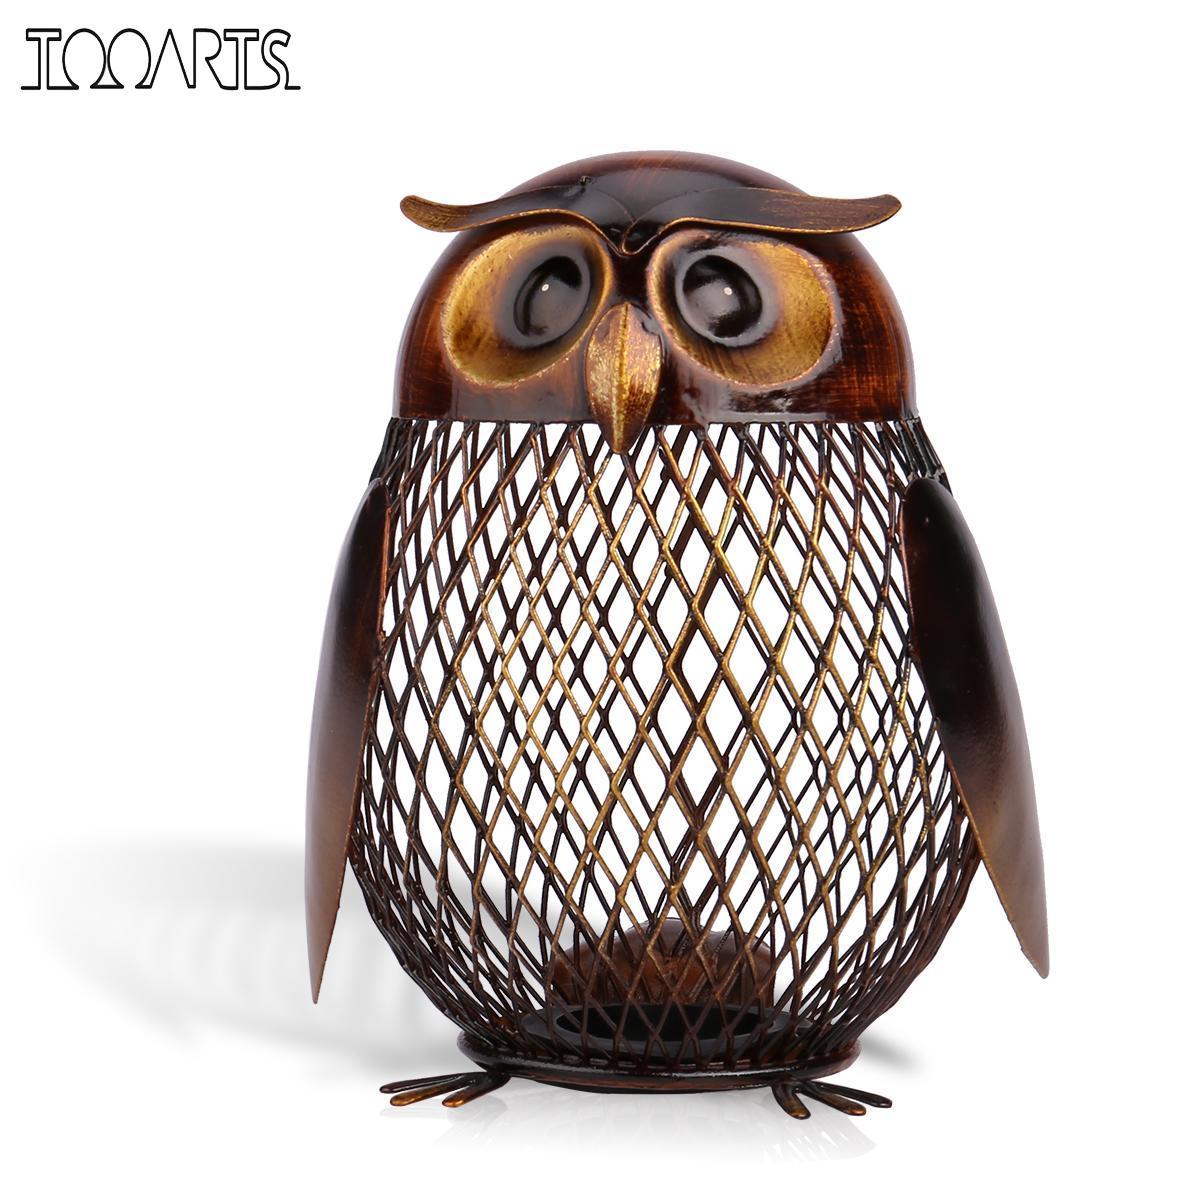 Tooarts Owl Shaped Figurine Piggy Bank Money Box Metal Figurine Coin Box Saving Box Home Decor Decoration Crafts Gift For Kids